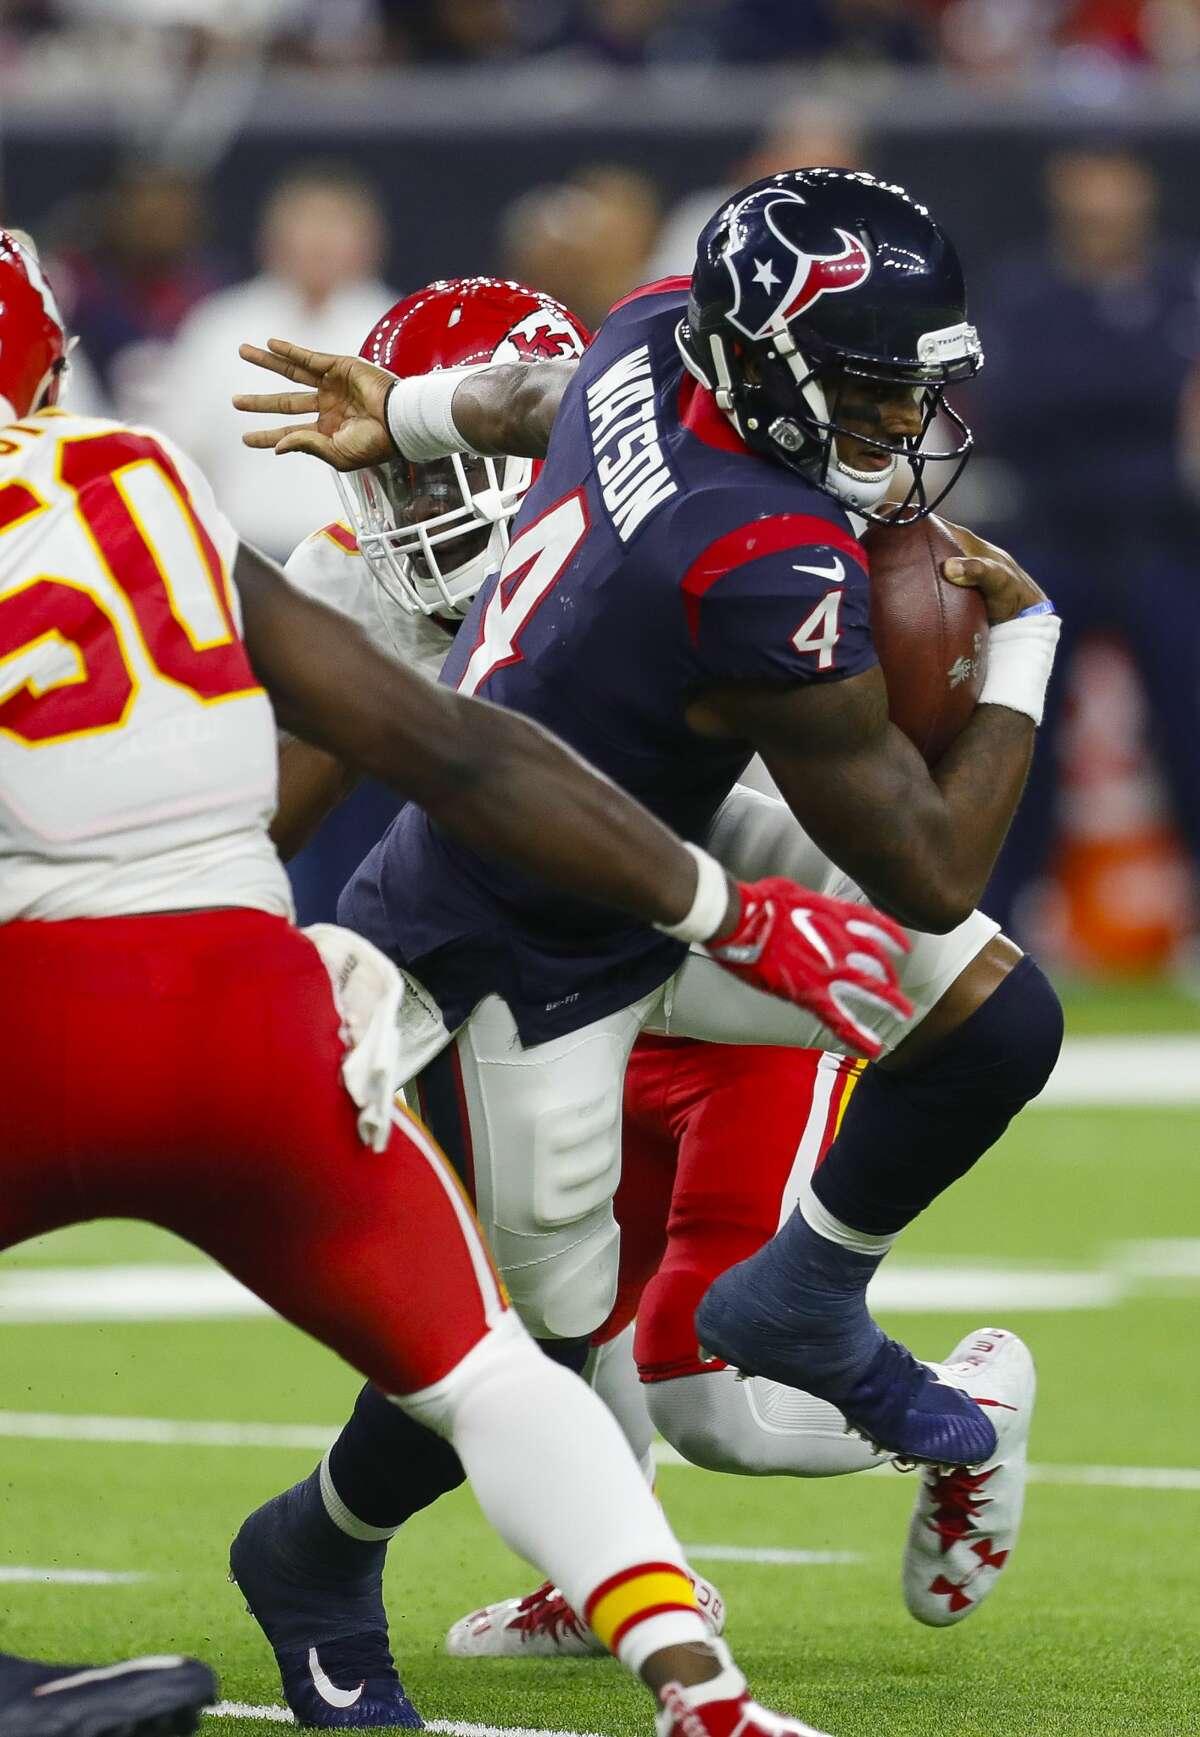 Houston Texans quarterback Deshaun Watson (4) looks for running space during the fourth quarter of an NFL football game at NRG Stadium on Sunday, Oct. 8, 2017, in Houston. ( Brett Coomer / Houston Chronicle )